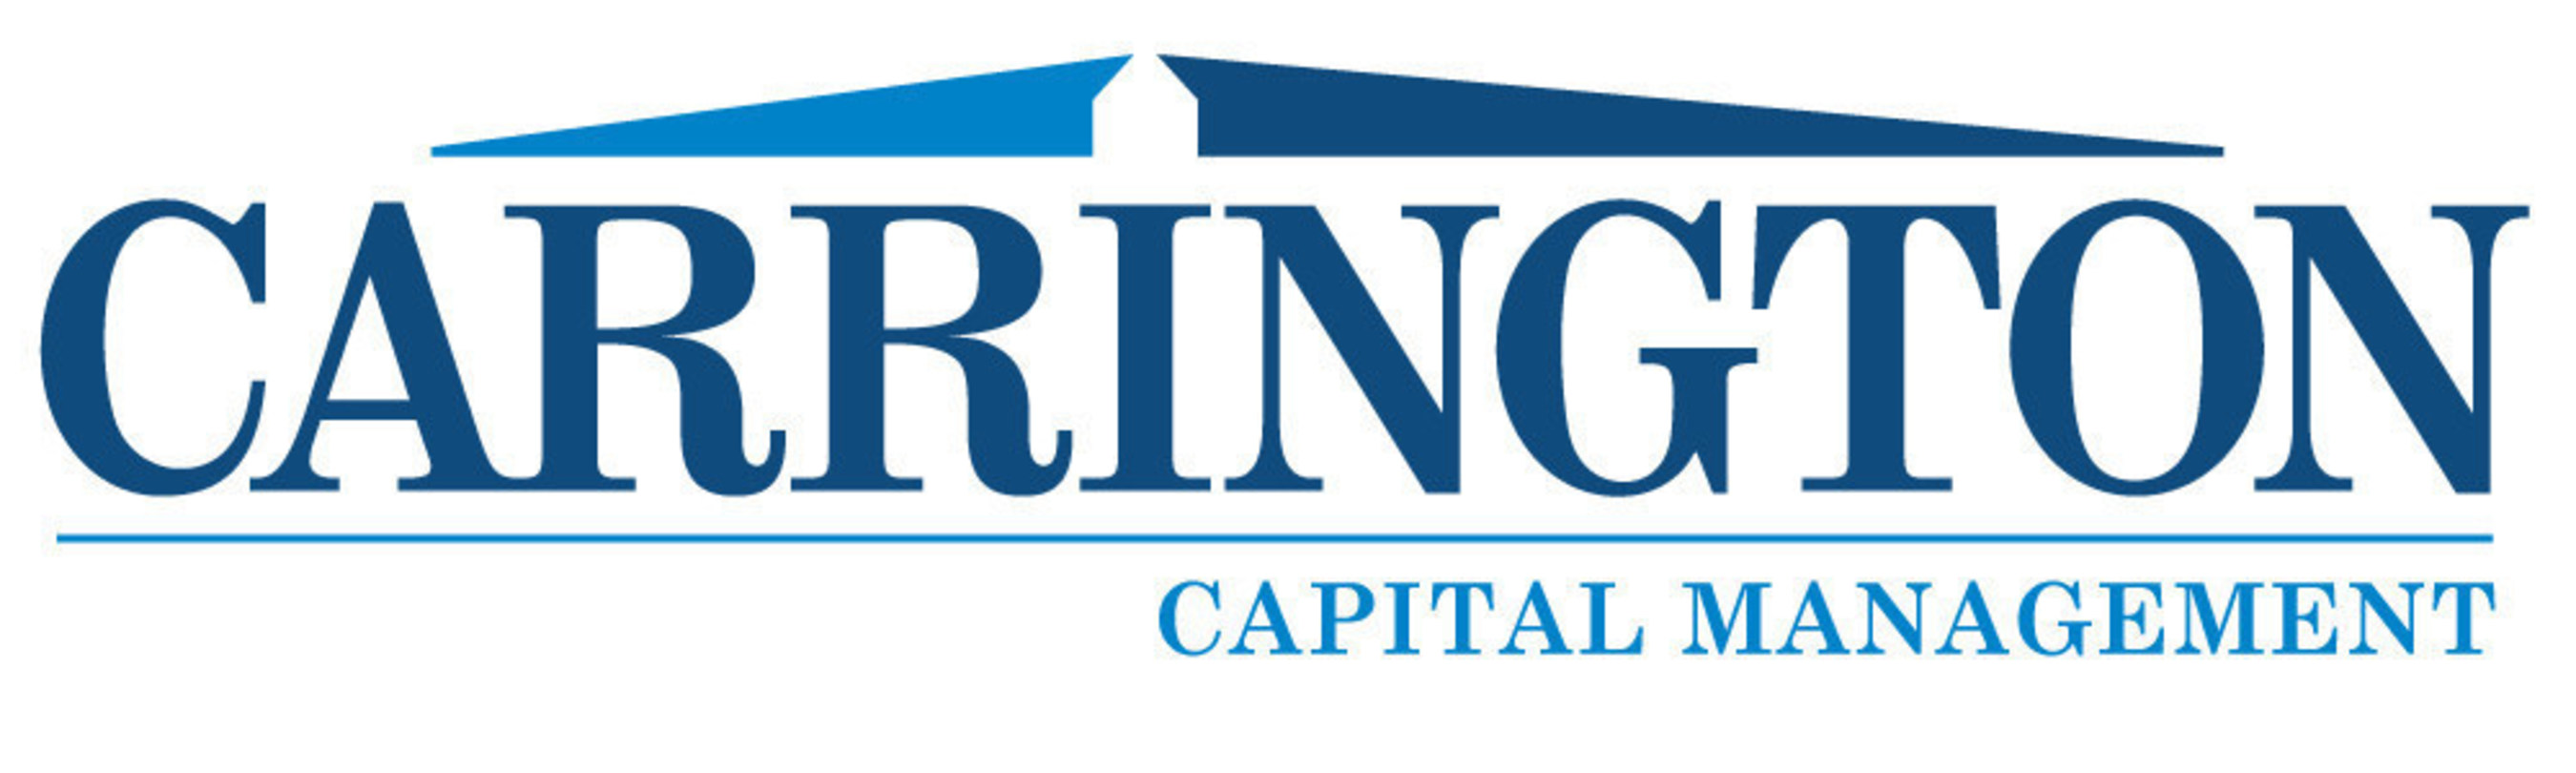 www.carringtoncap.com